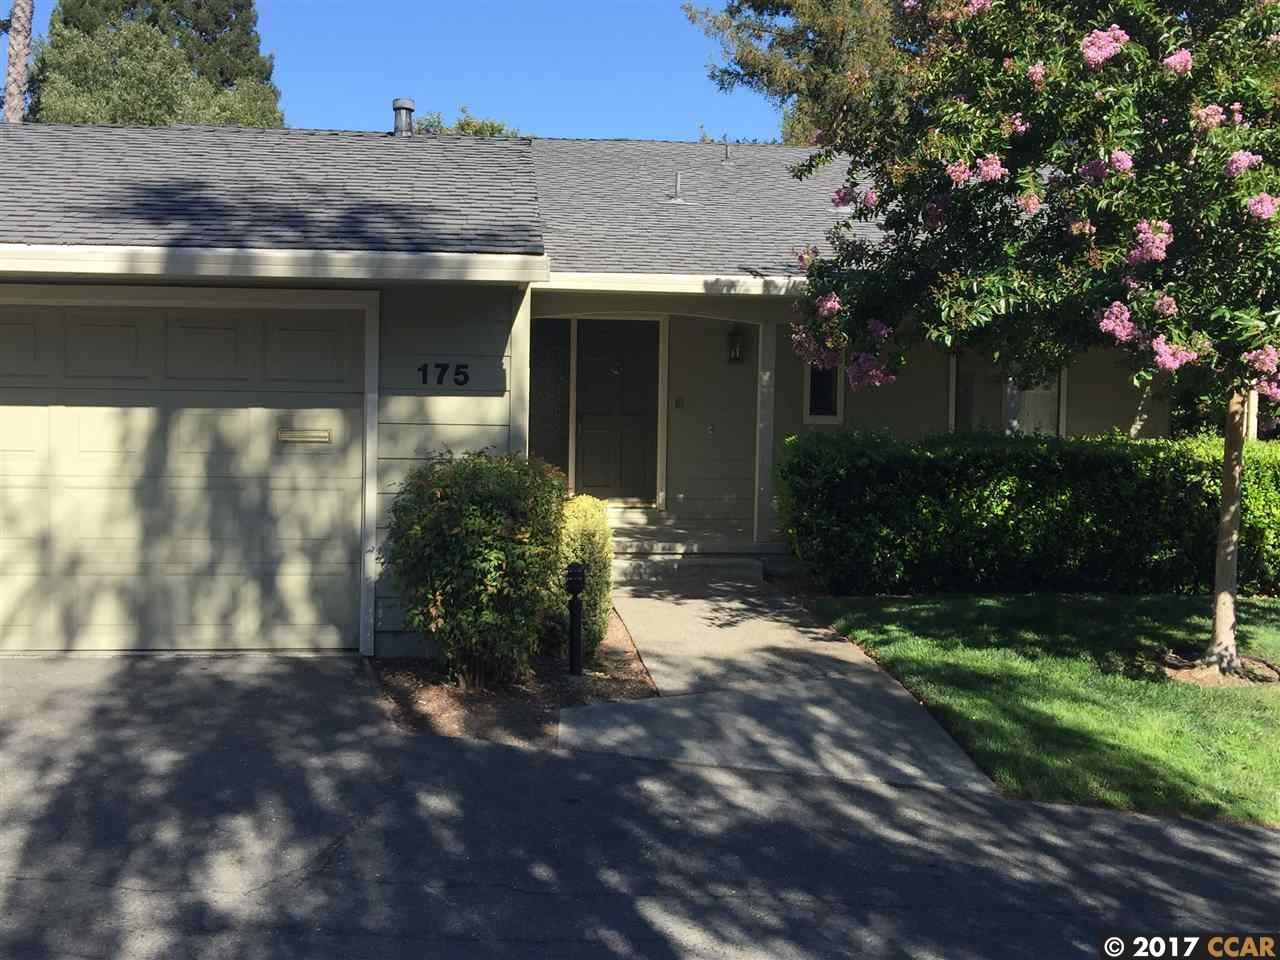 獨棟家庭住宅 為 出租 在 175 Cypress Point Way 175 Cypress Point Way Moraga, 加利福尼亞州 94556 美國